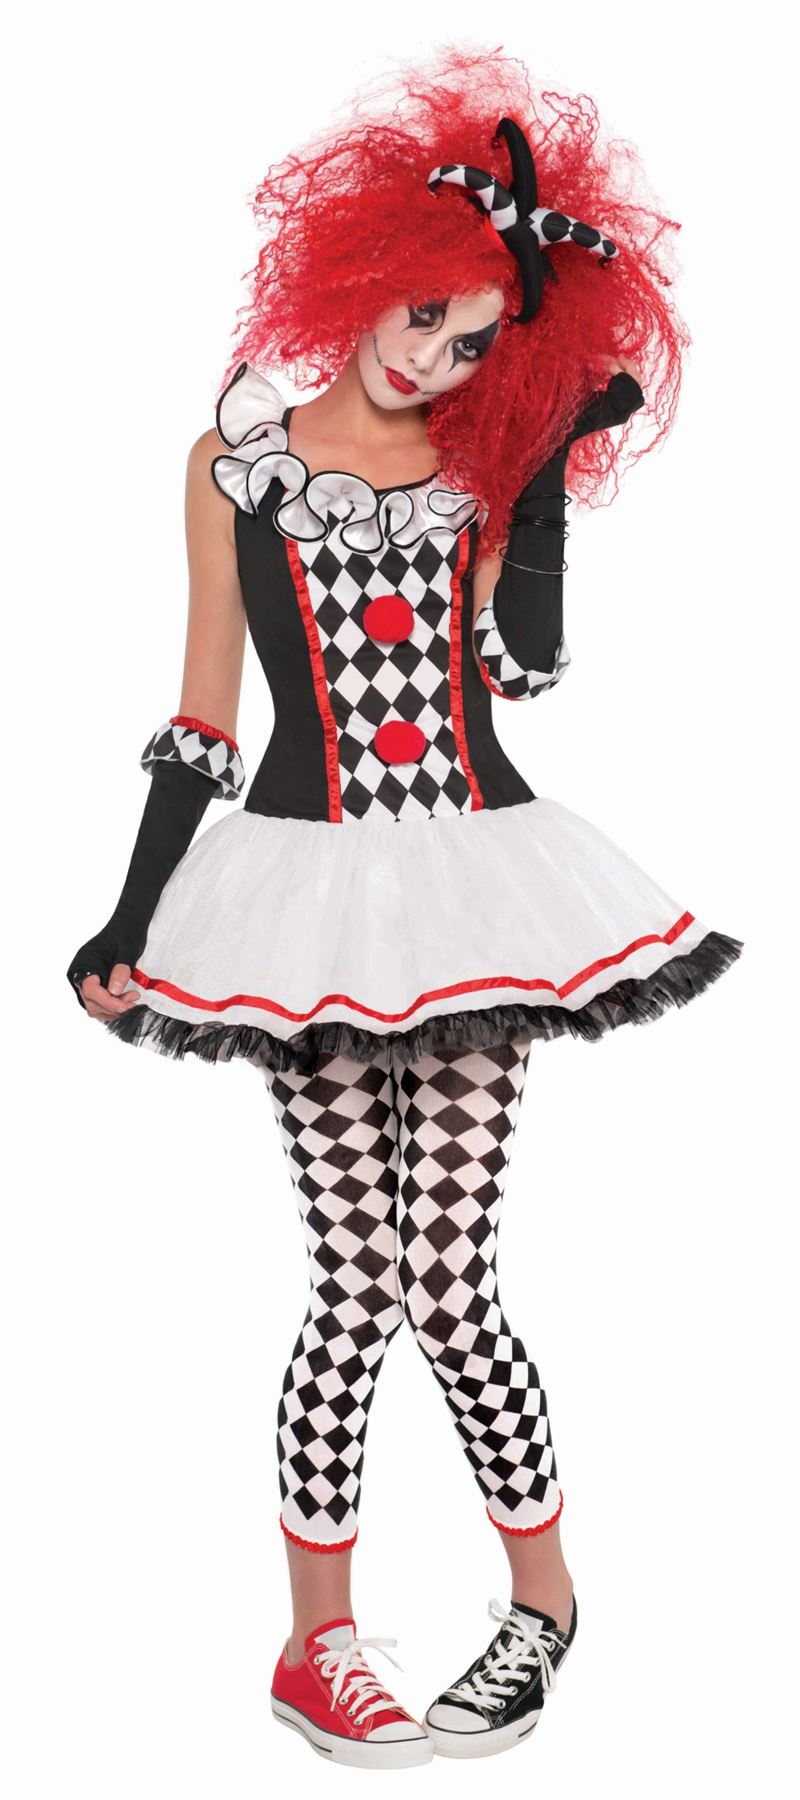 Harlequin Collant più taglie bianco nero per adulti donna Halloween Fancy Dress